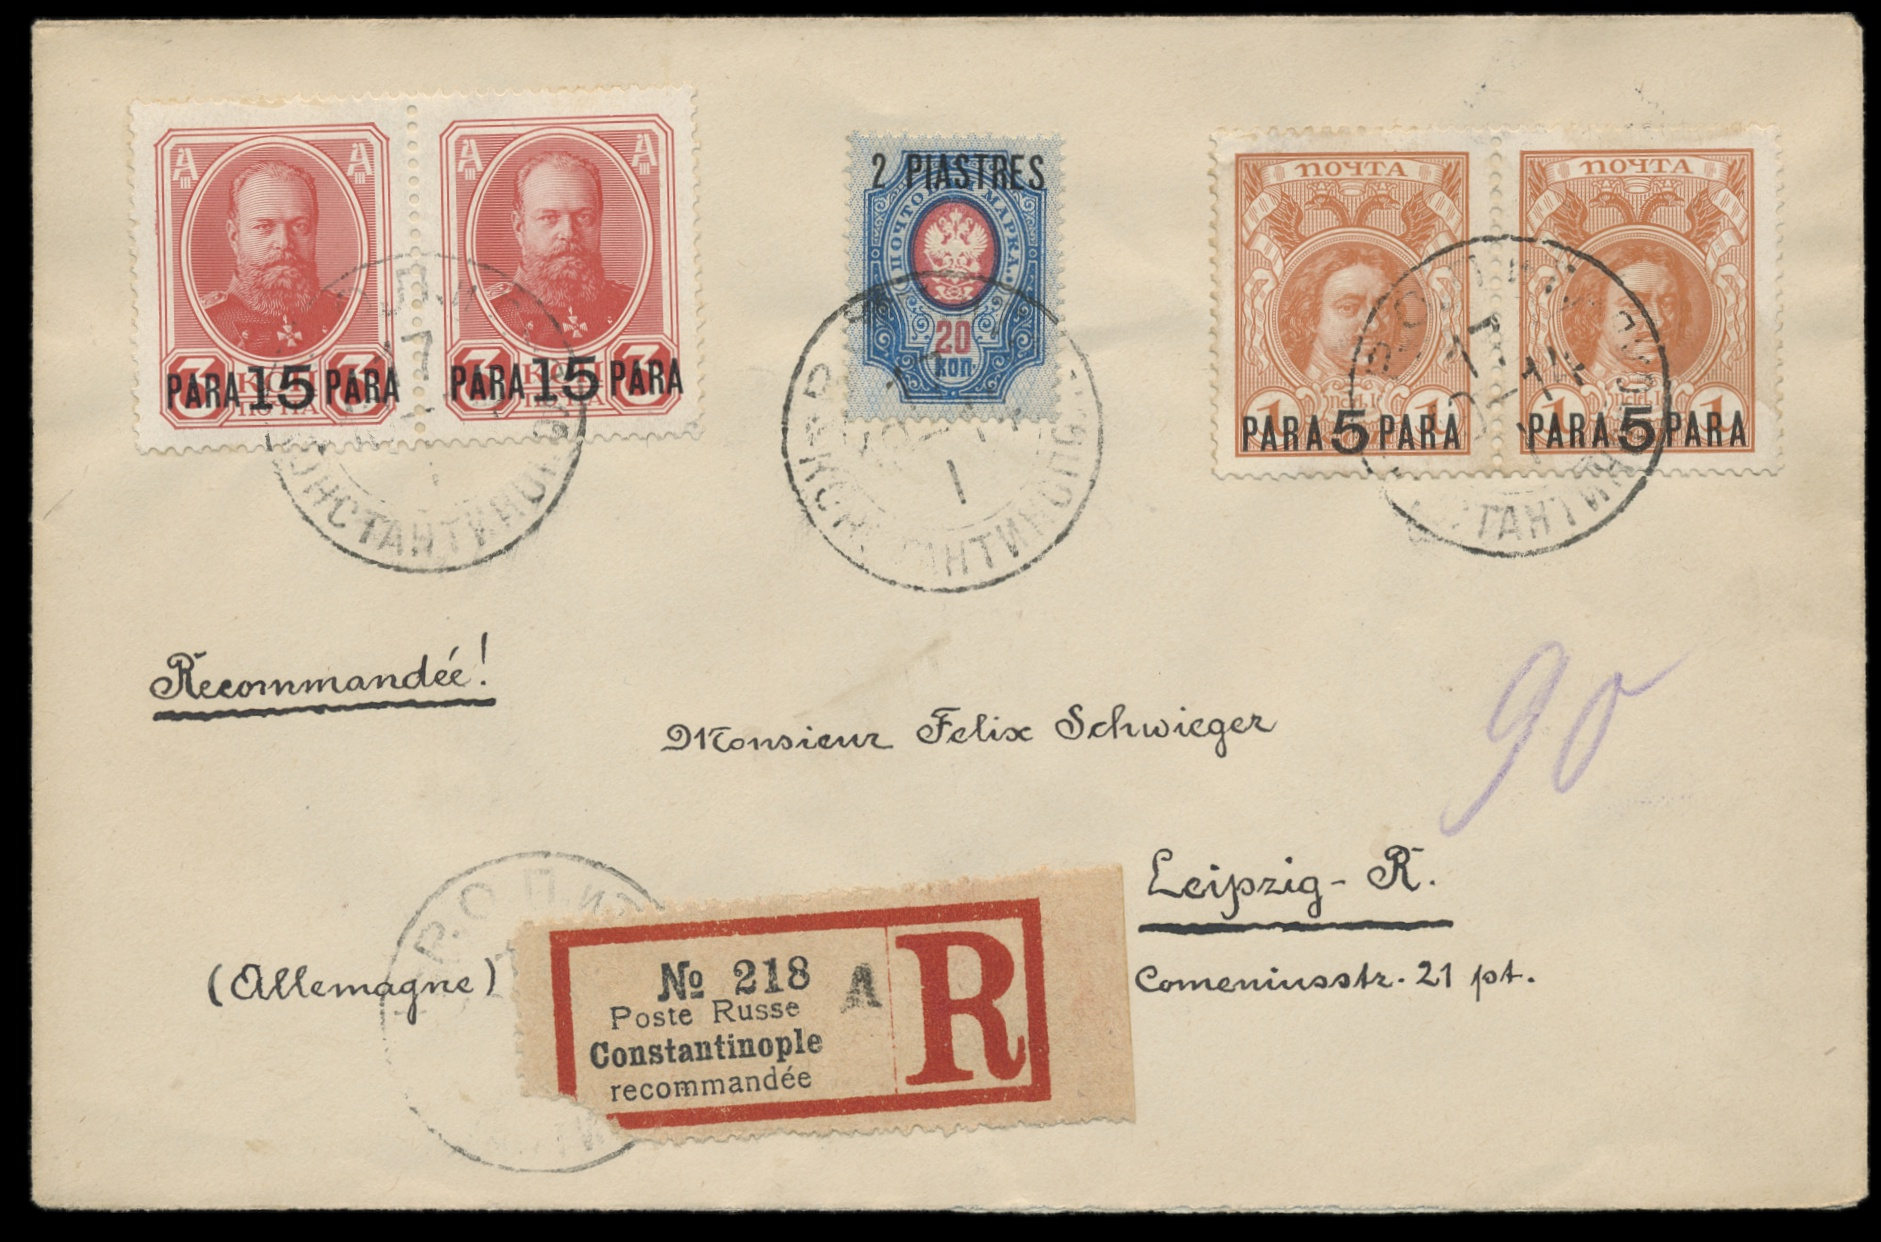 Lot 437 - europa Rußland / UdSSR -  Peter Harlos Auctions 42. Harlos Auktion